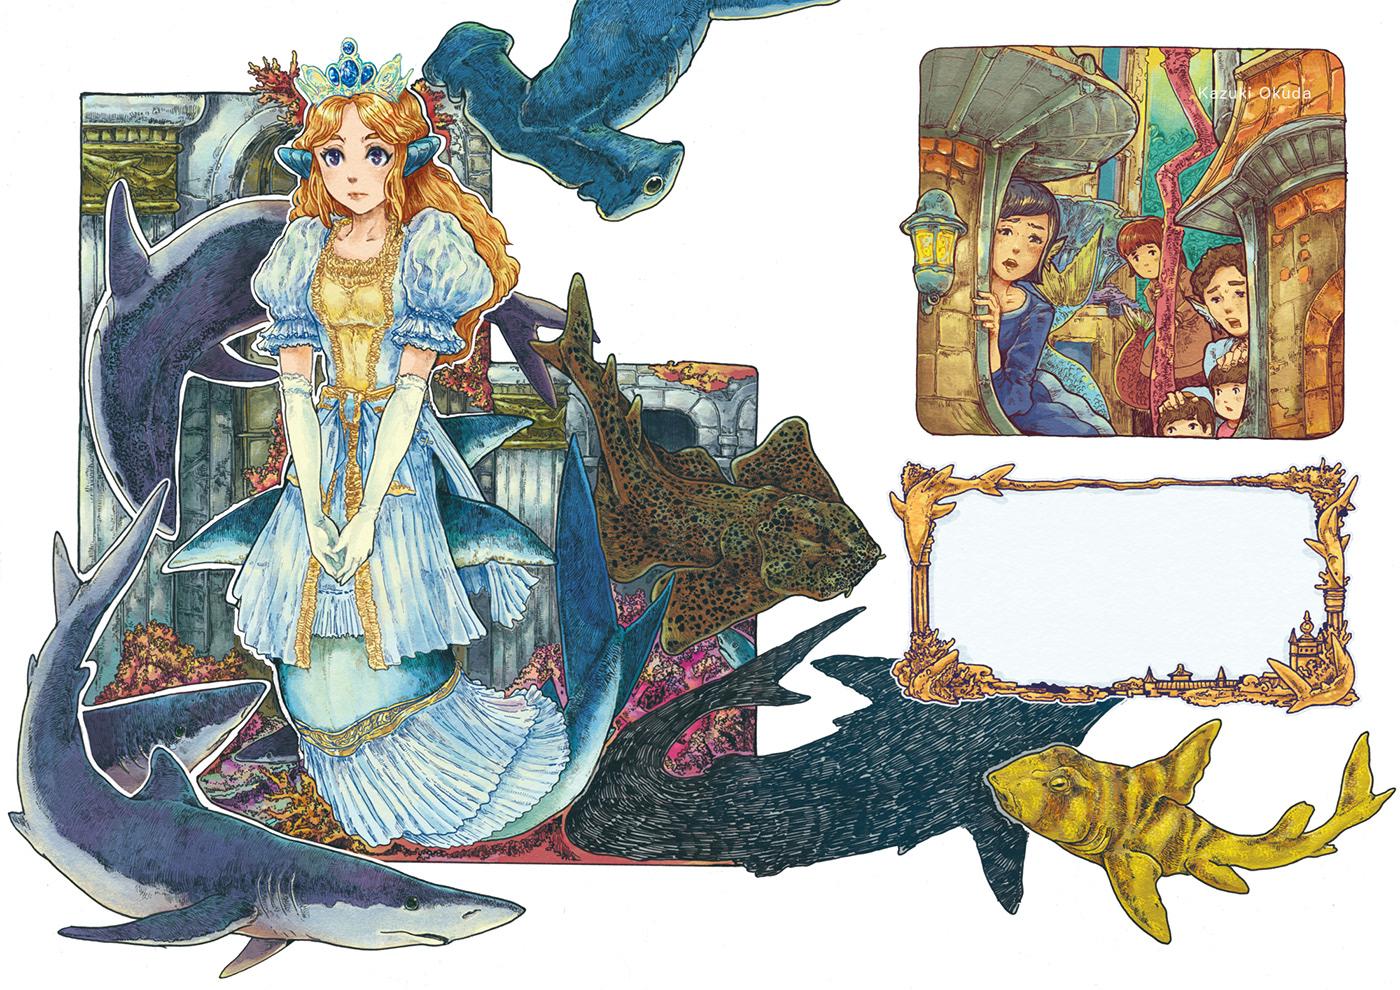 fairytale fantasy illust ILLUSTRATION  mermaid Nature Ocean photoshop picturebook Princess